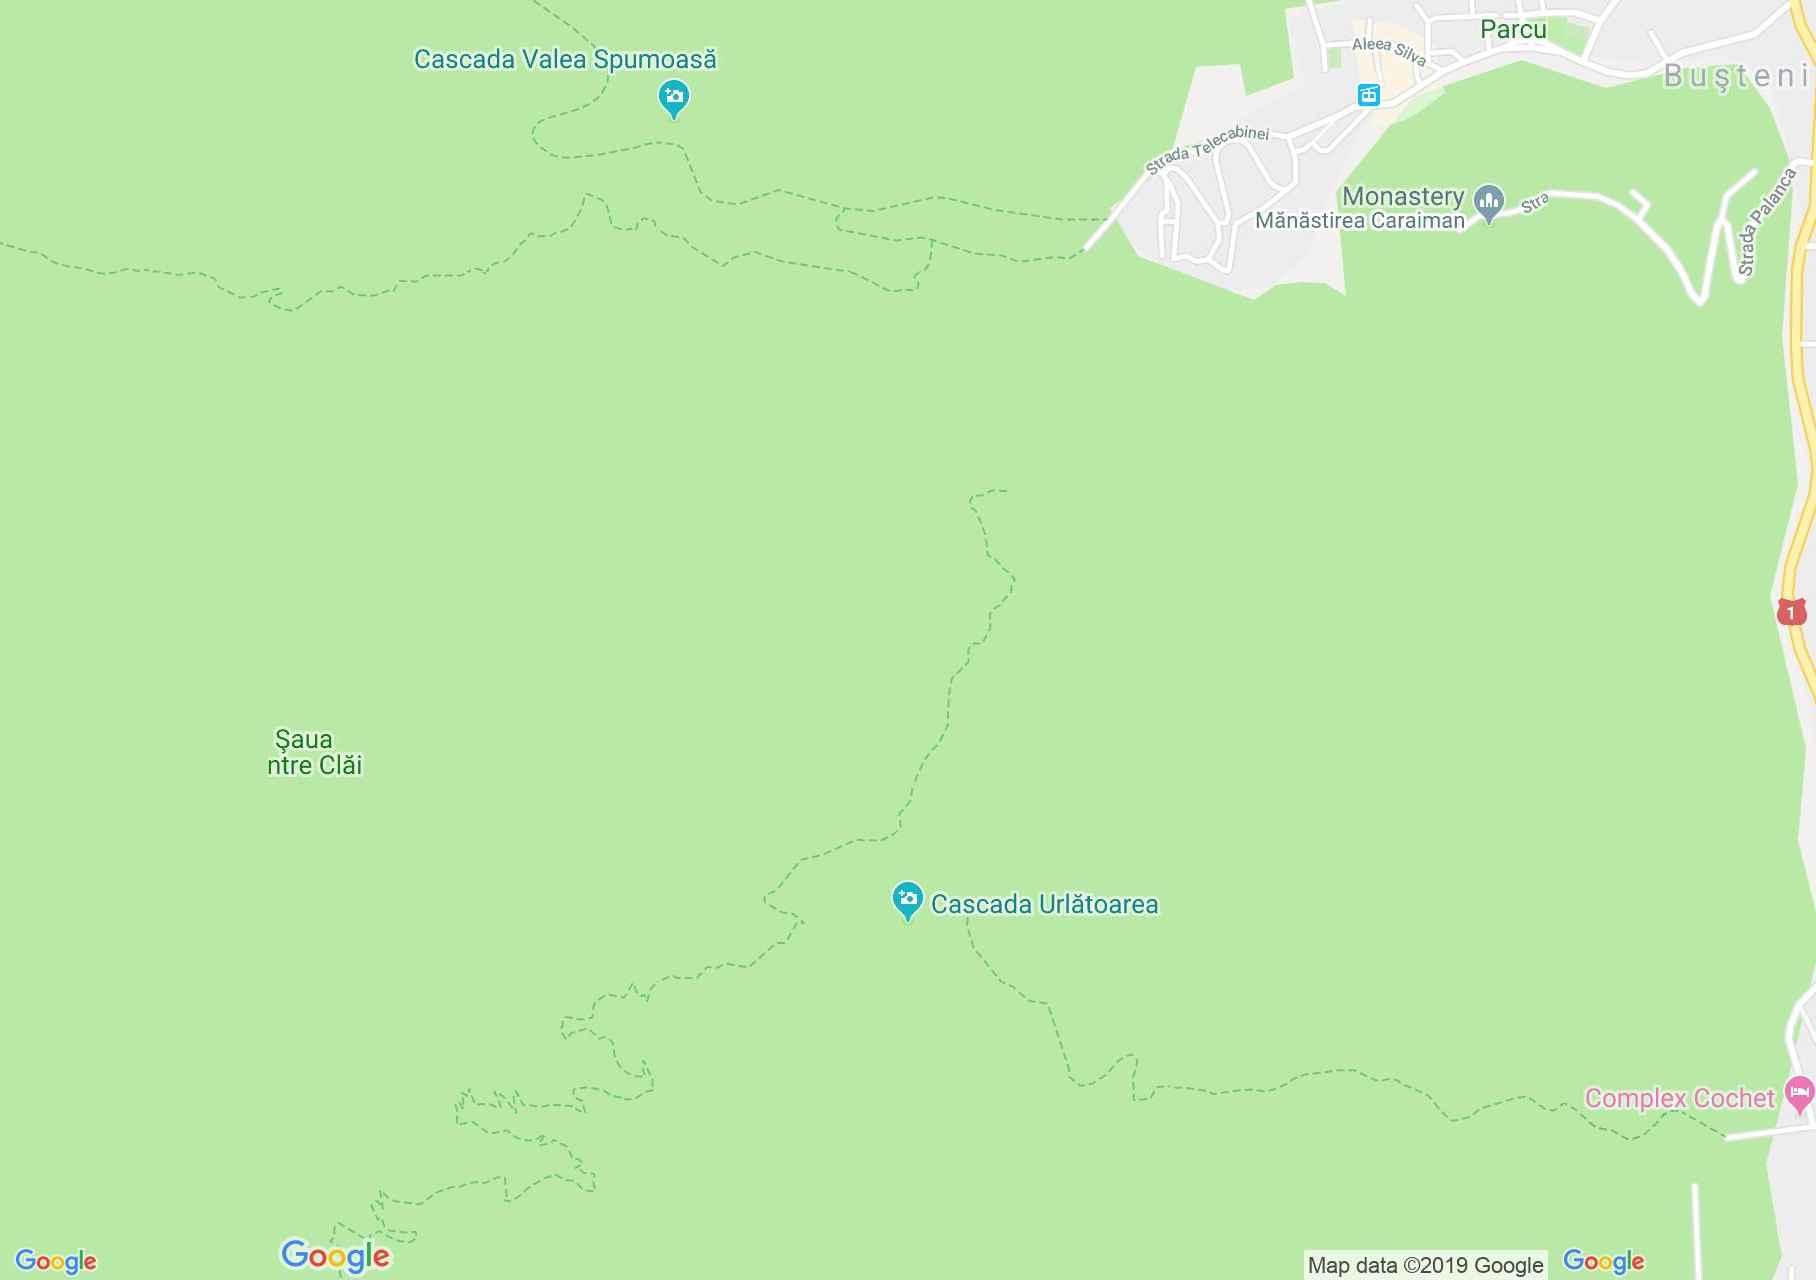 Map of Busteni: Urlatoarea Waterfall